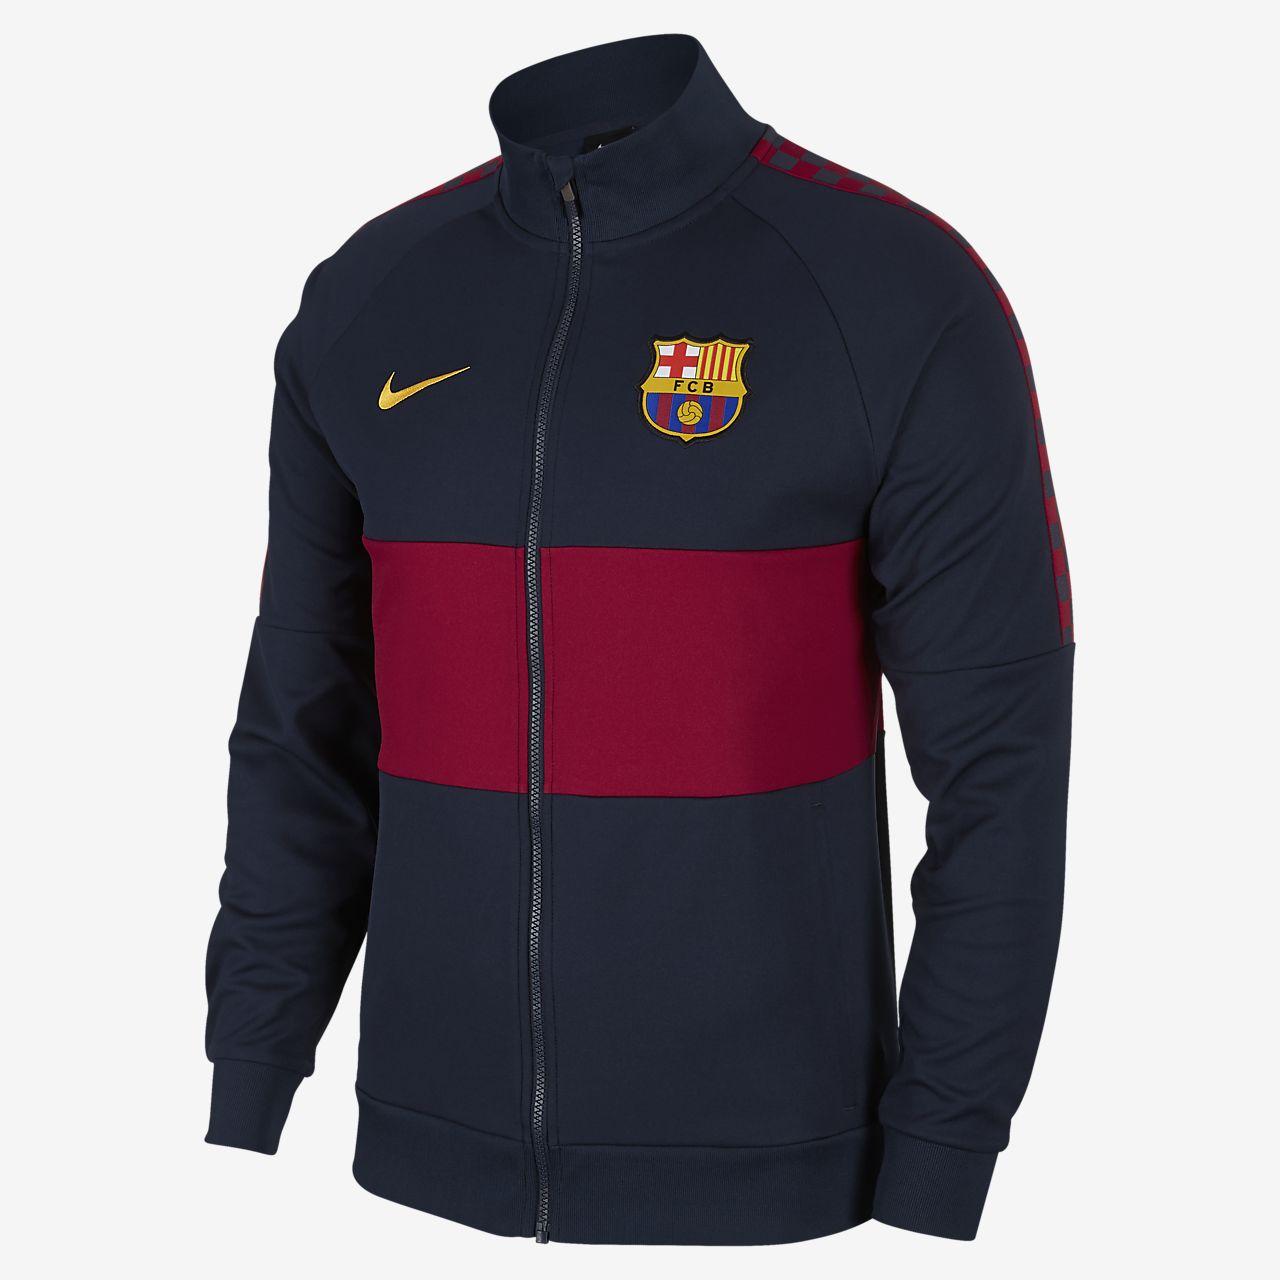 6ca04d53132e5 Low Resolution Pánská bunda FC Barcelona Pánská bunda FC Barcelona